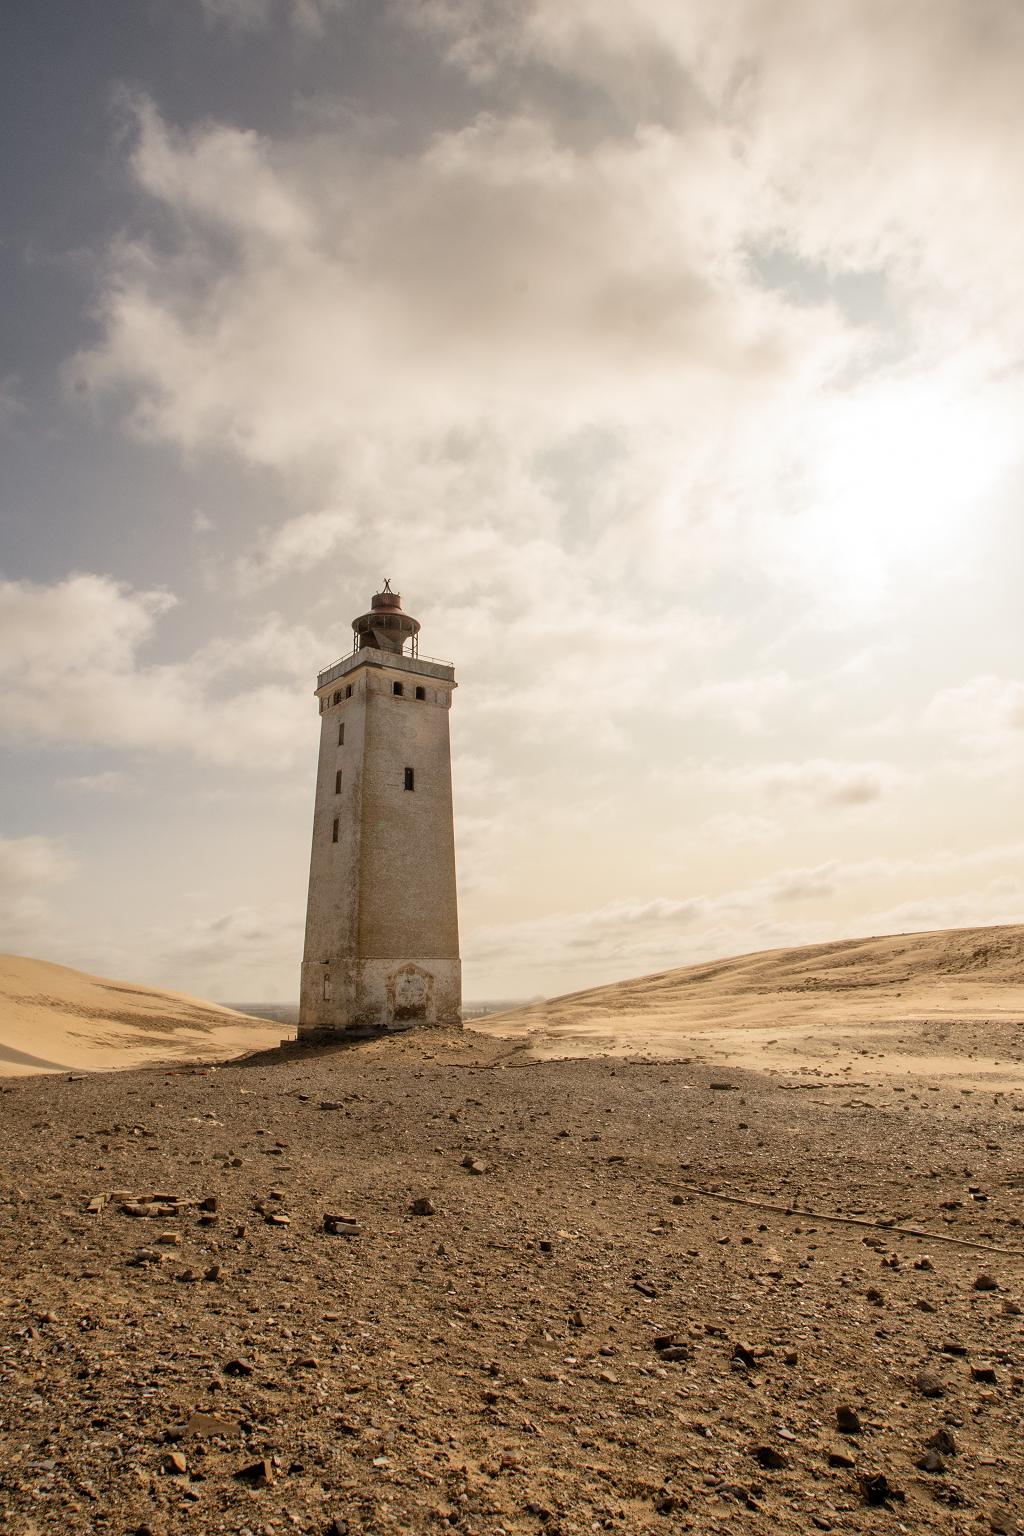 Leuchtturm im Sand